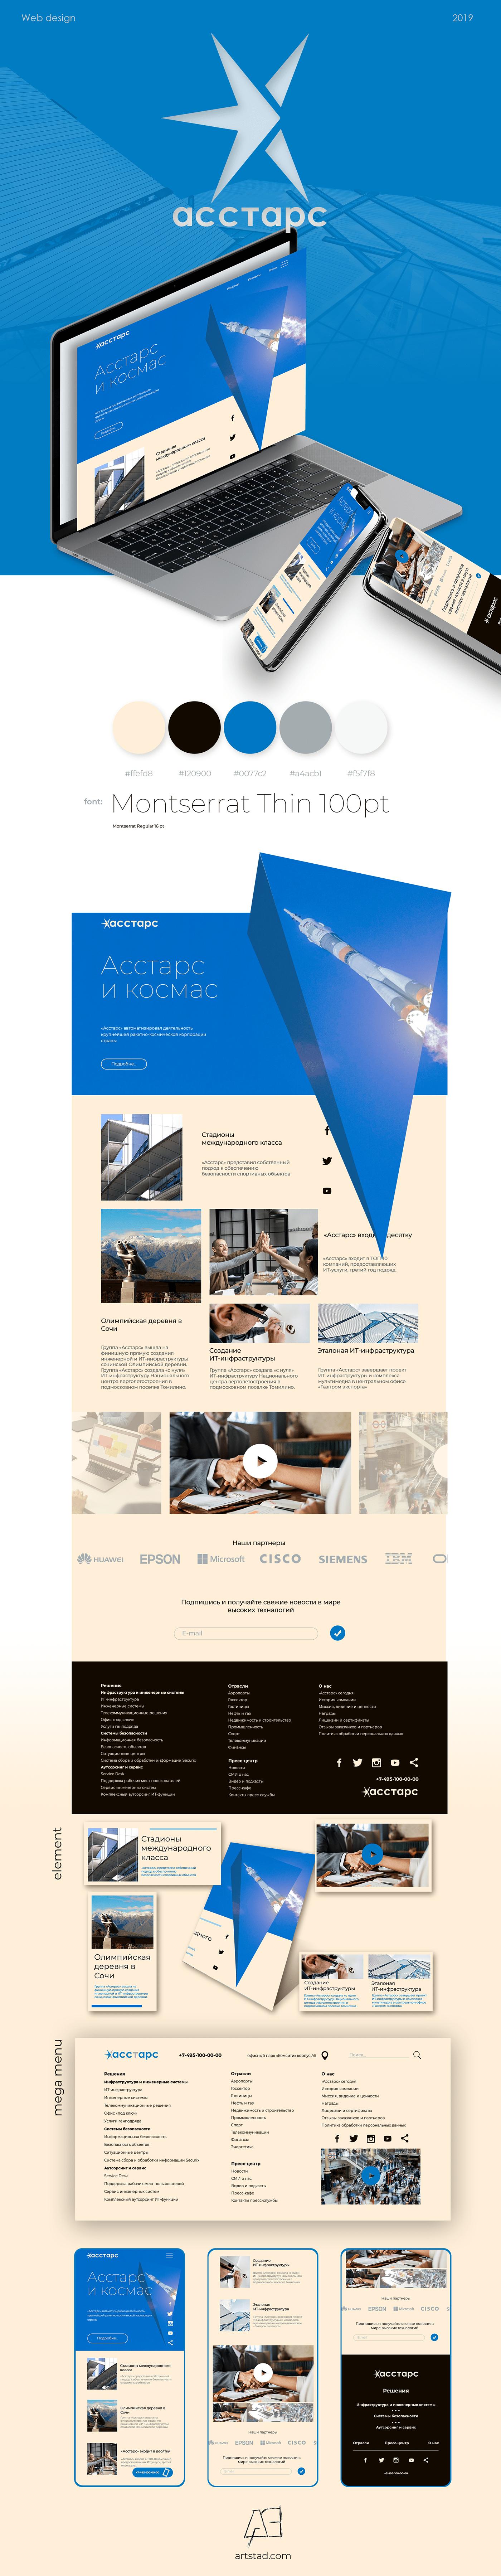 Business Website corporate Website деловой сайт Корпоративный сайт